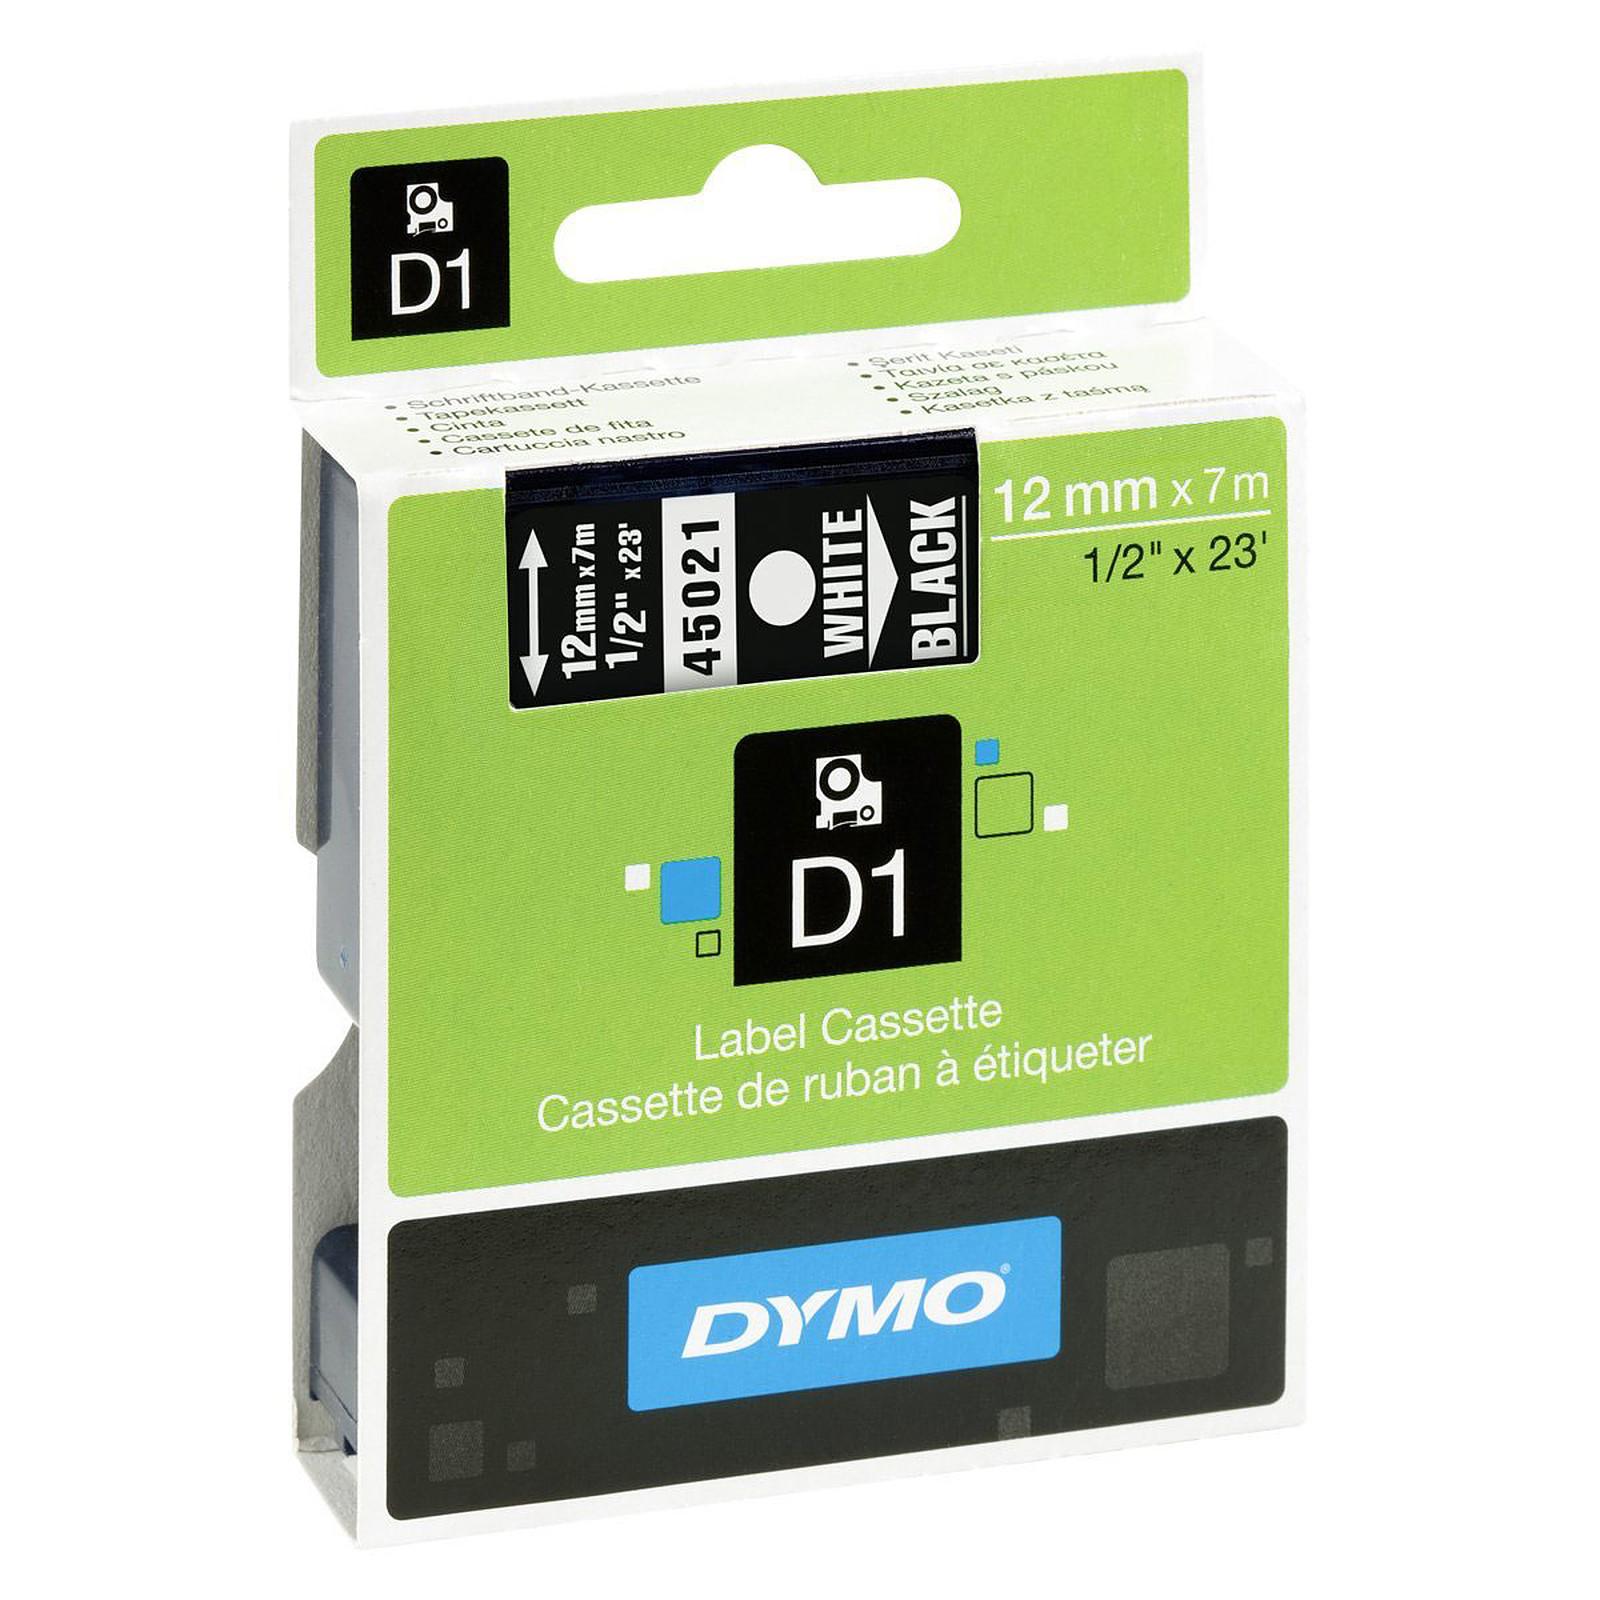 DYMO Cinta D1 estándar - blanco/negro 12 mm x 7 m